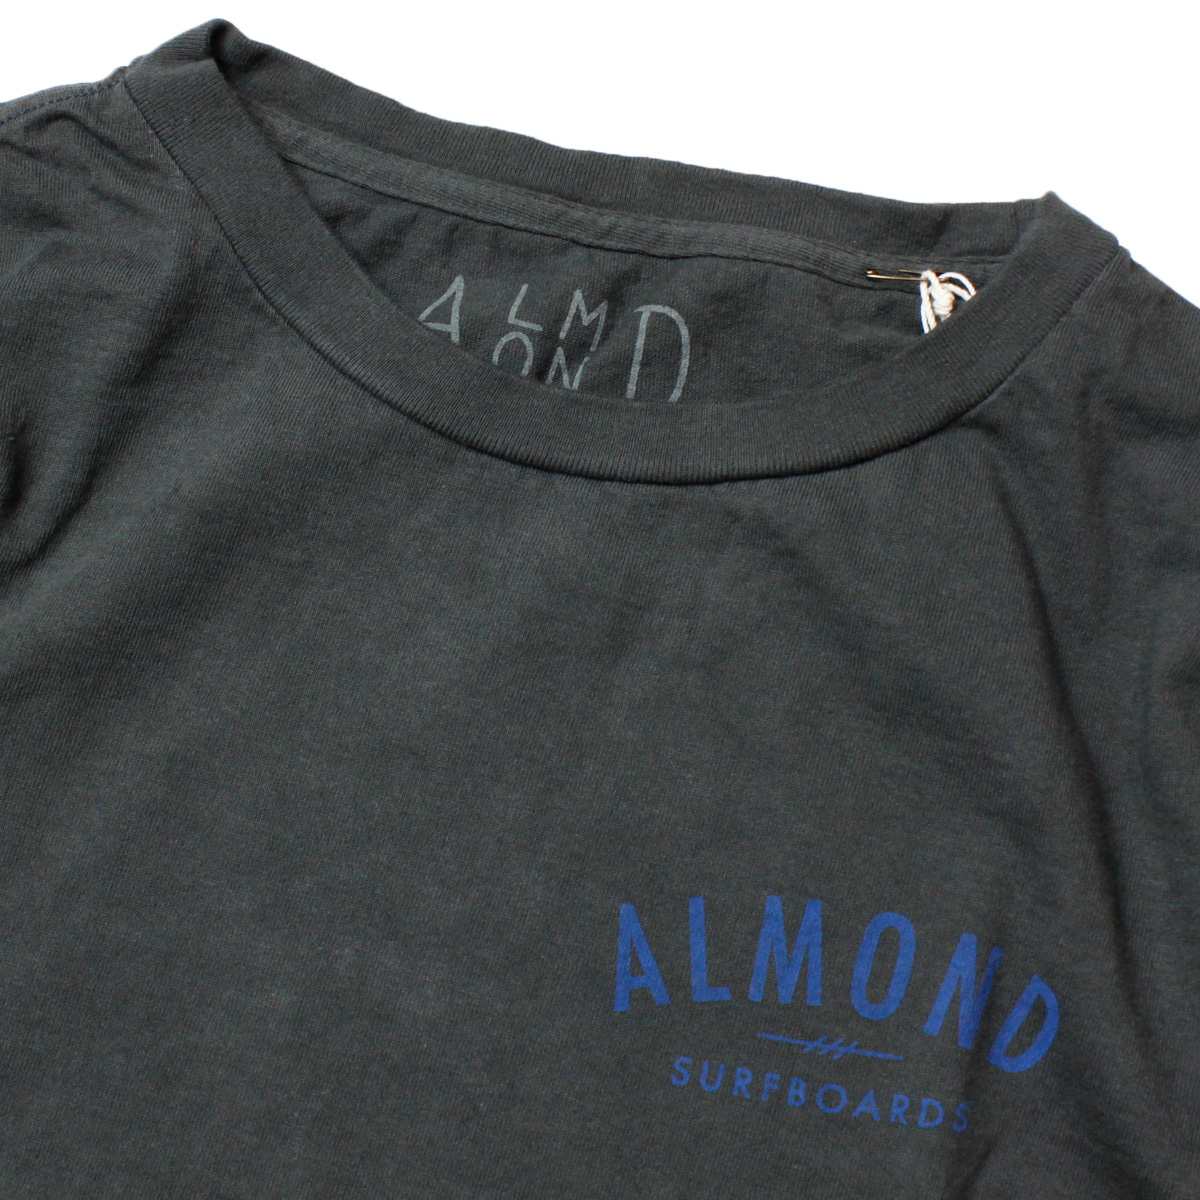 Almond Surf アーモンドサーフボードデザイン DIAMOND A LOGO L/S T-SHIRTS